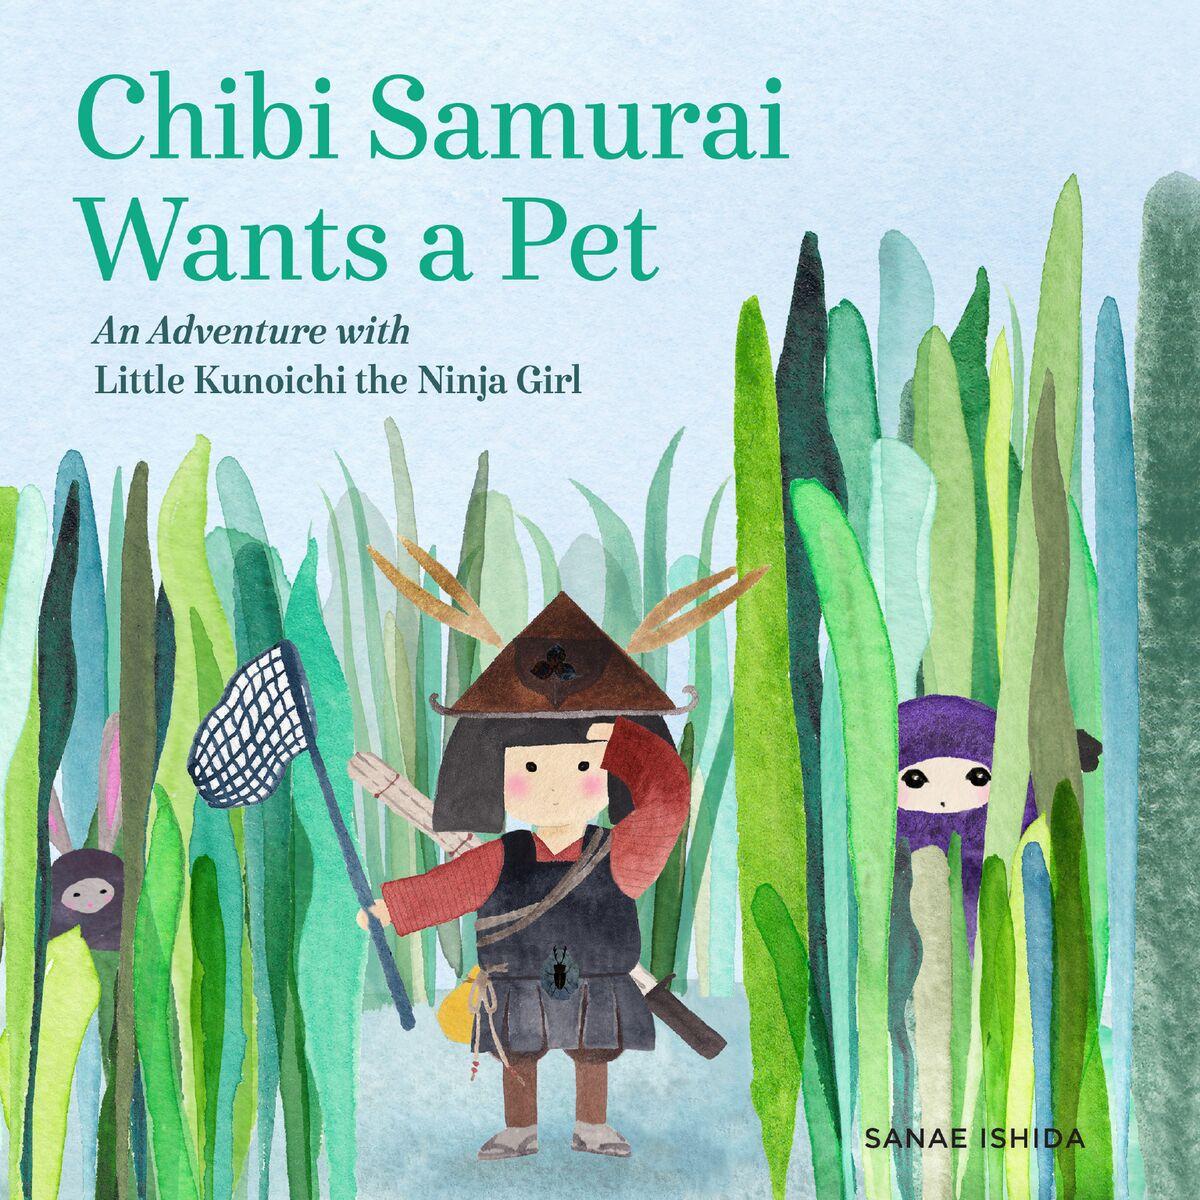 cover reveal! Chibi Samurai Wants a Pet by Sanae Ishida